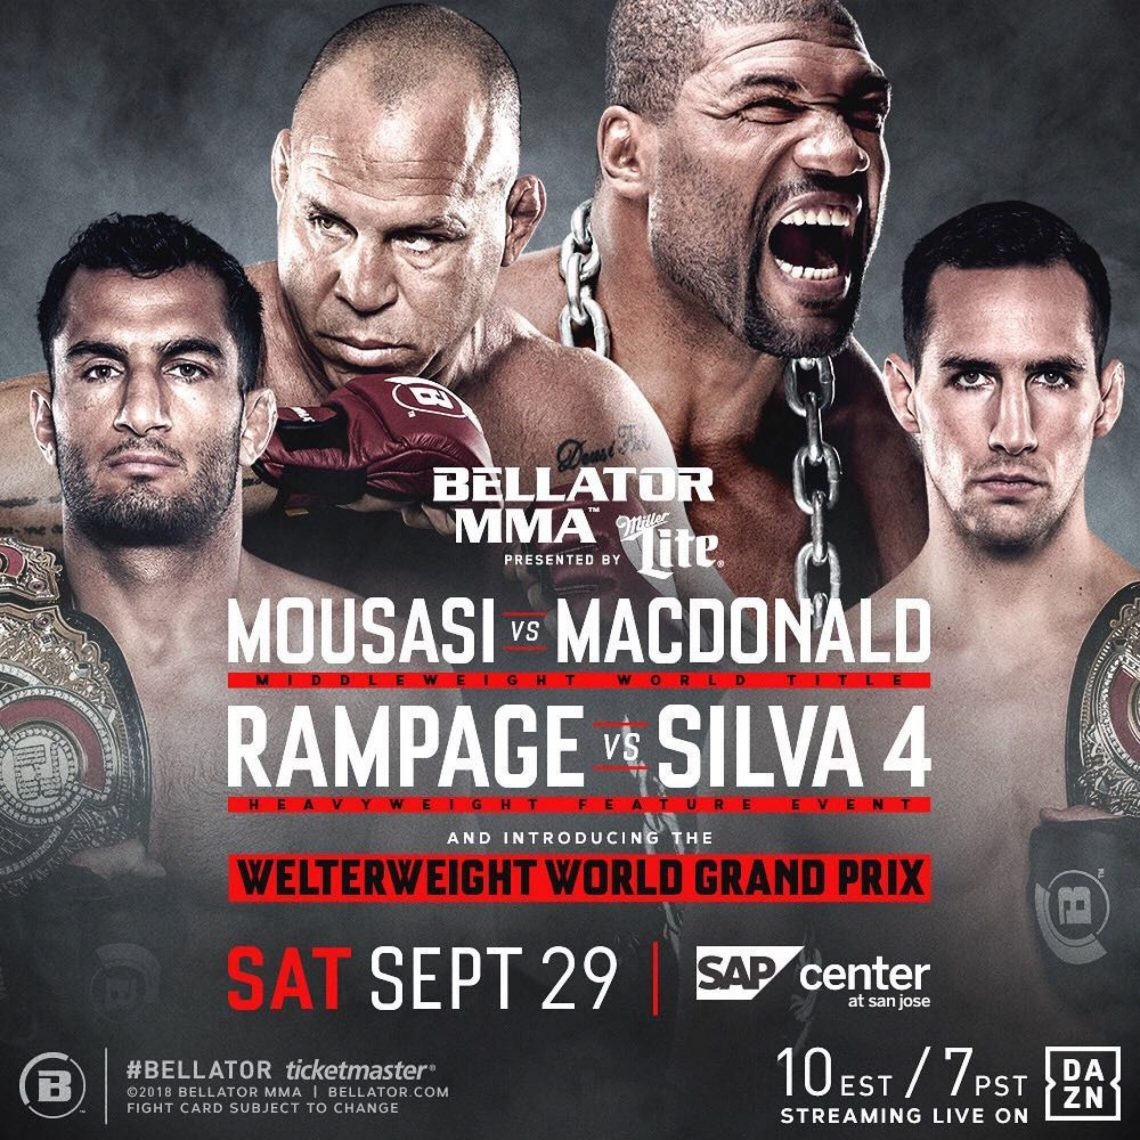 Risultati Bellator 206: McDonald vs Mousasi 1